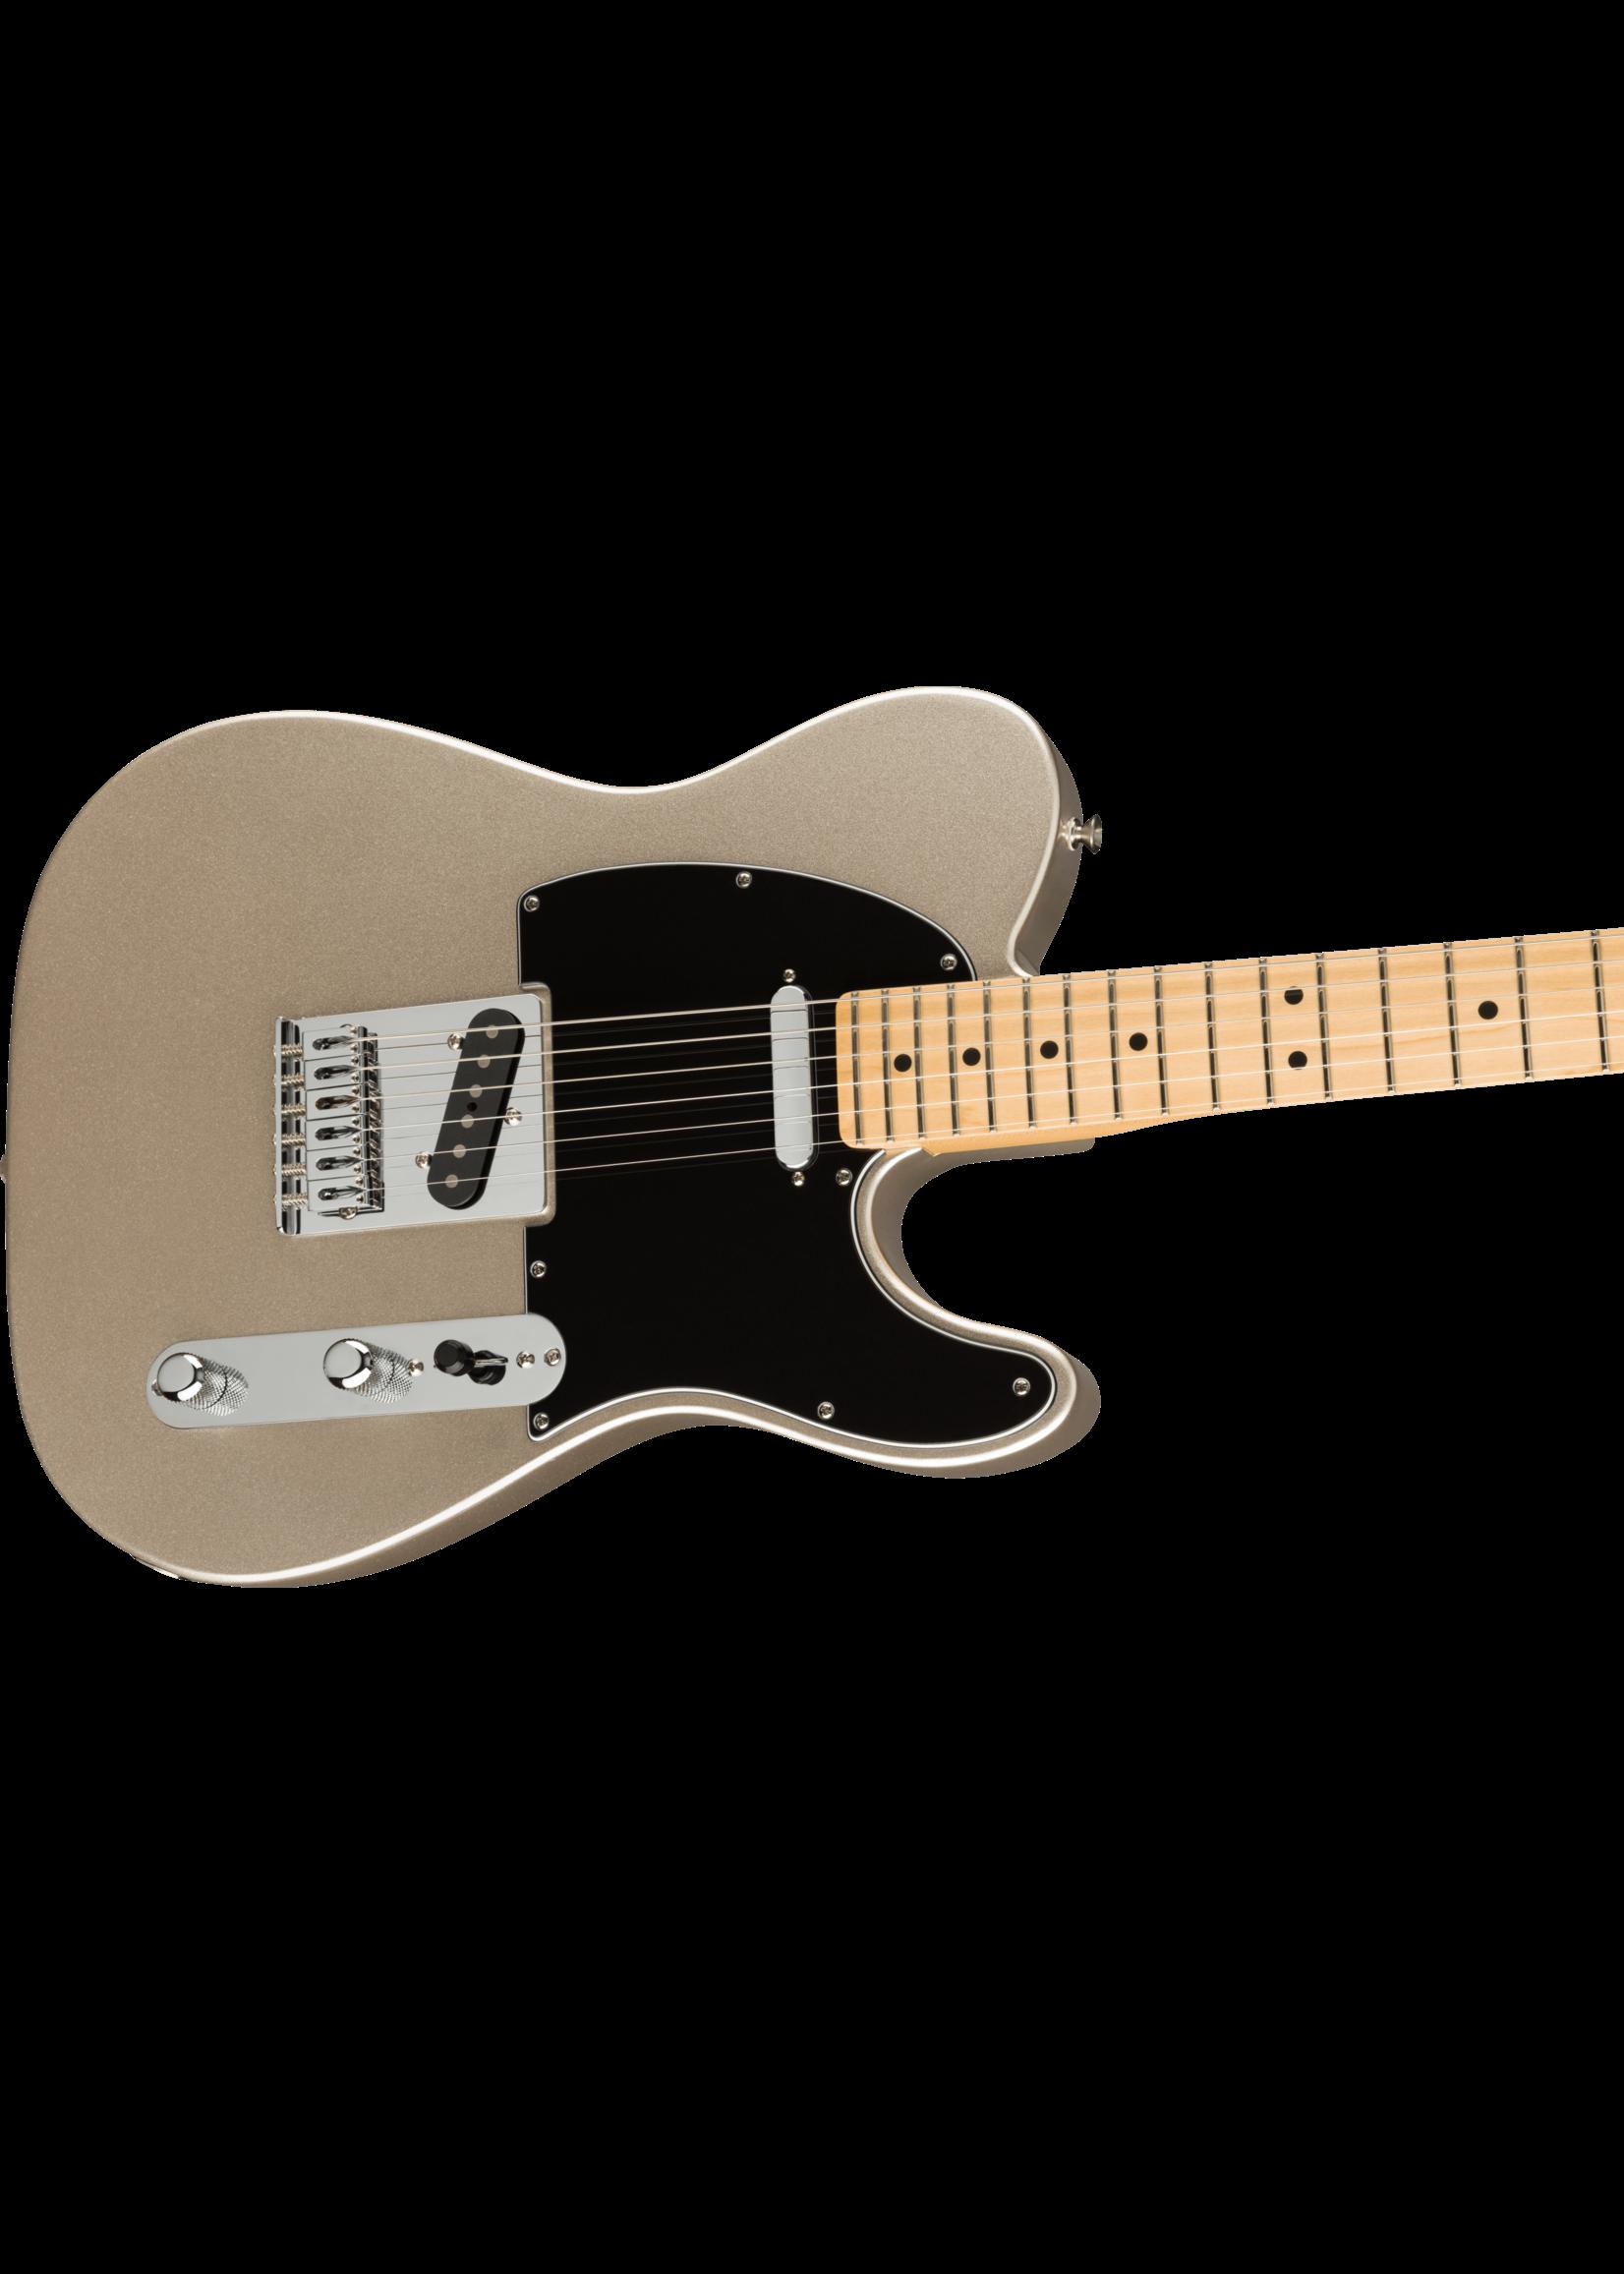 Fender Fender 75th Anniversary Telecaster Diamond Anniversary